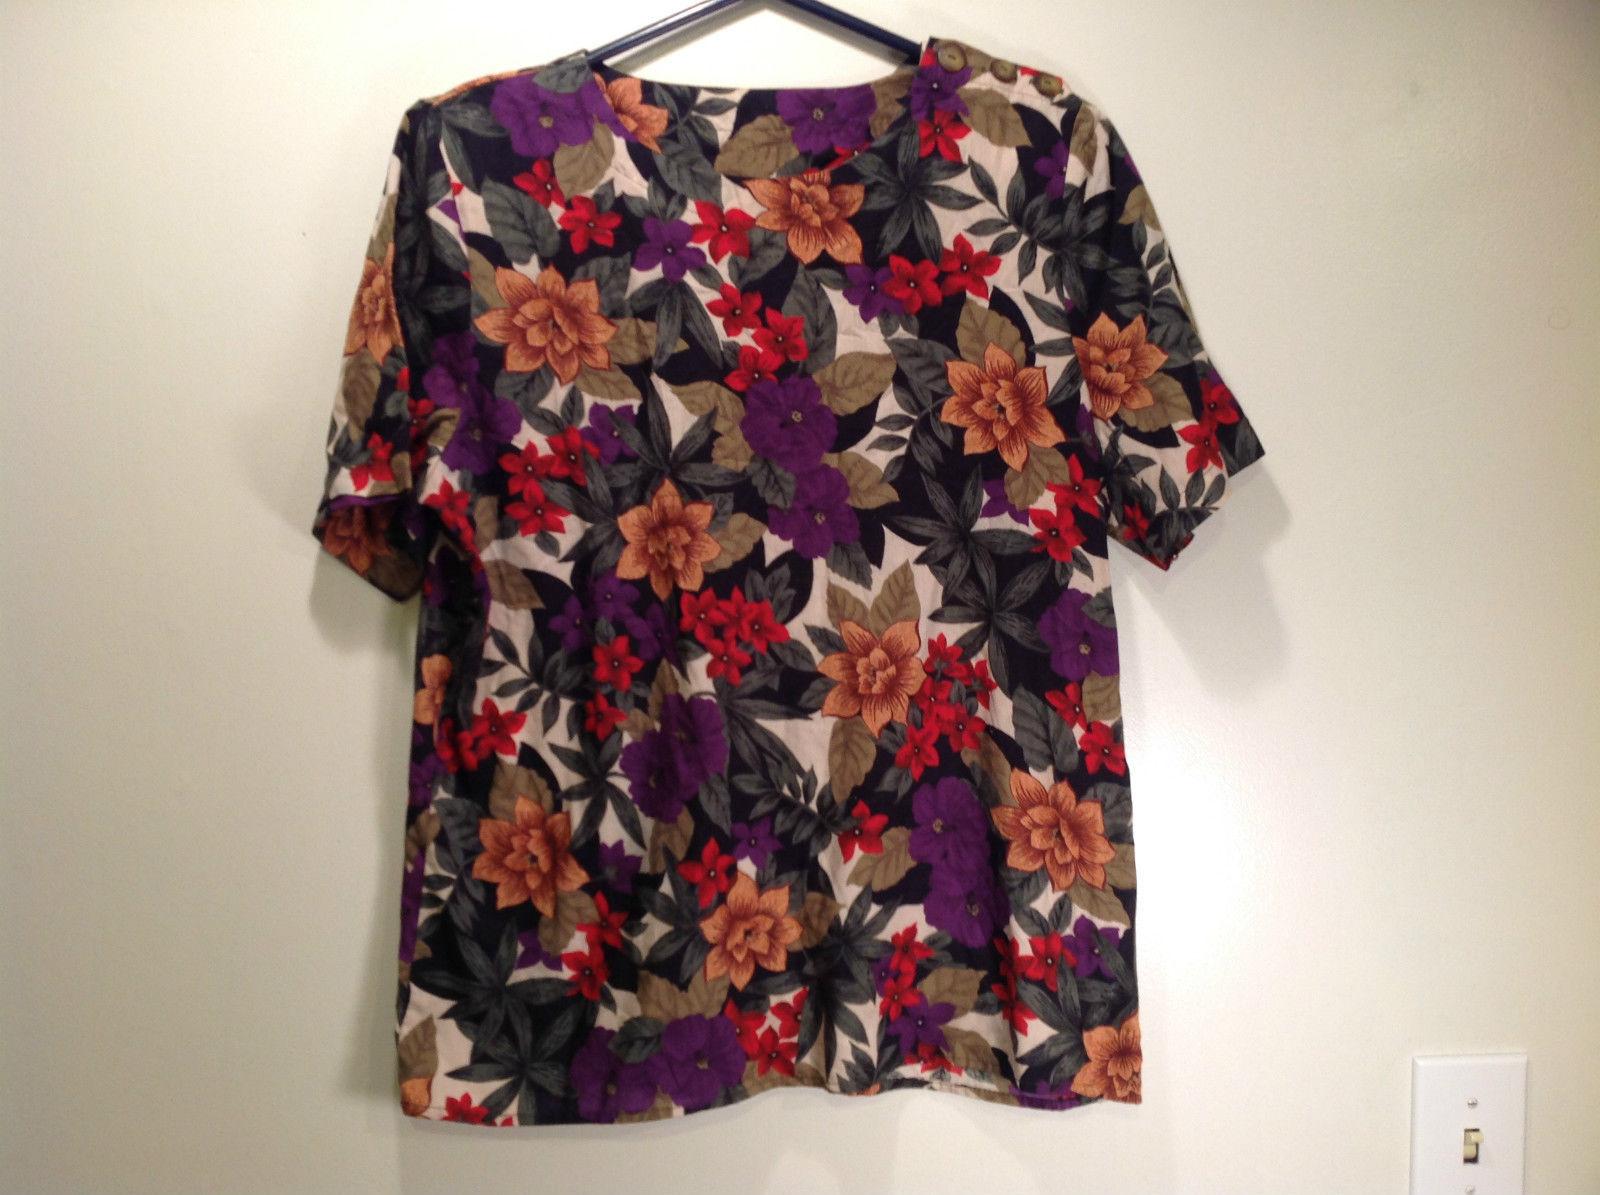 Cristin Stevens Multicolored Floral Short Sleeve Top Button Closure on Shoulder